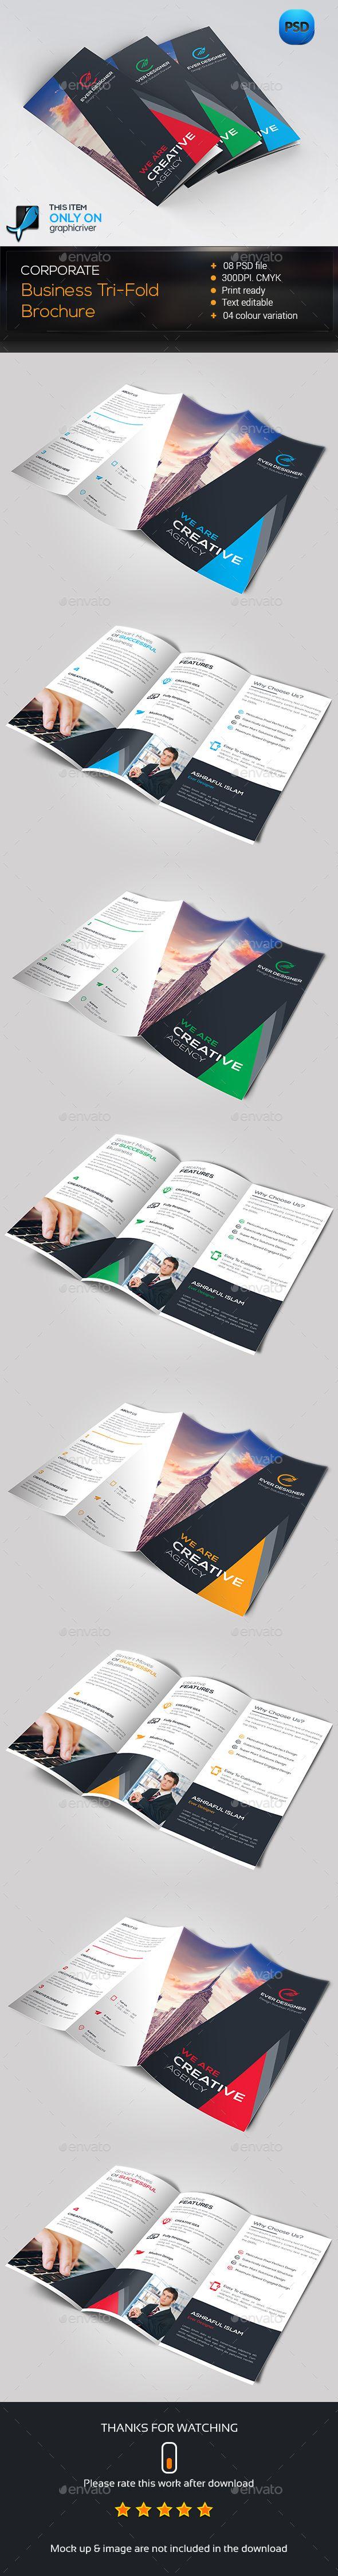 Trifold Brochure Template PSD #design Download: http://graphicriver.net/item/trifold-brochure/14286880?ref=ksioks